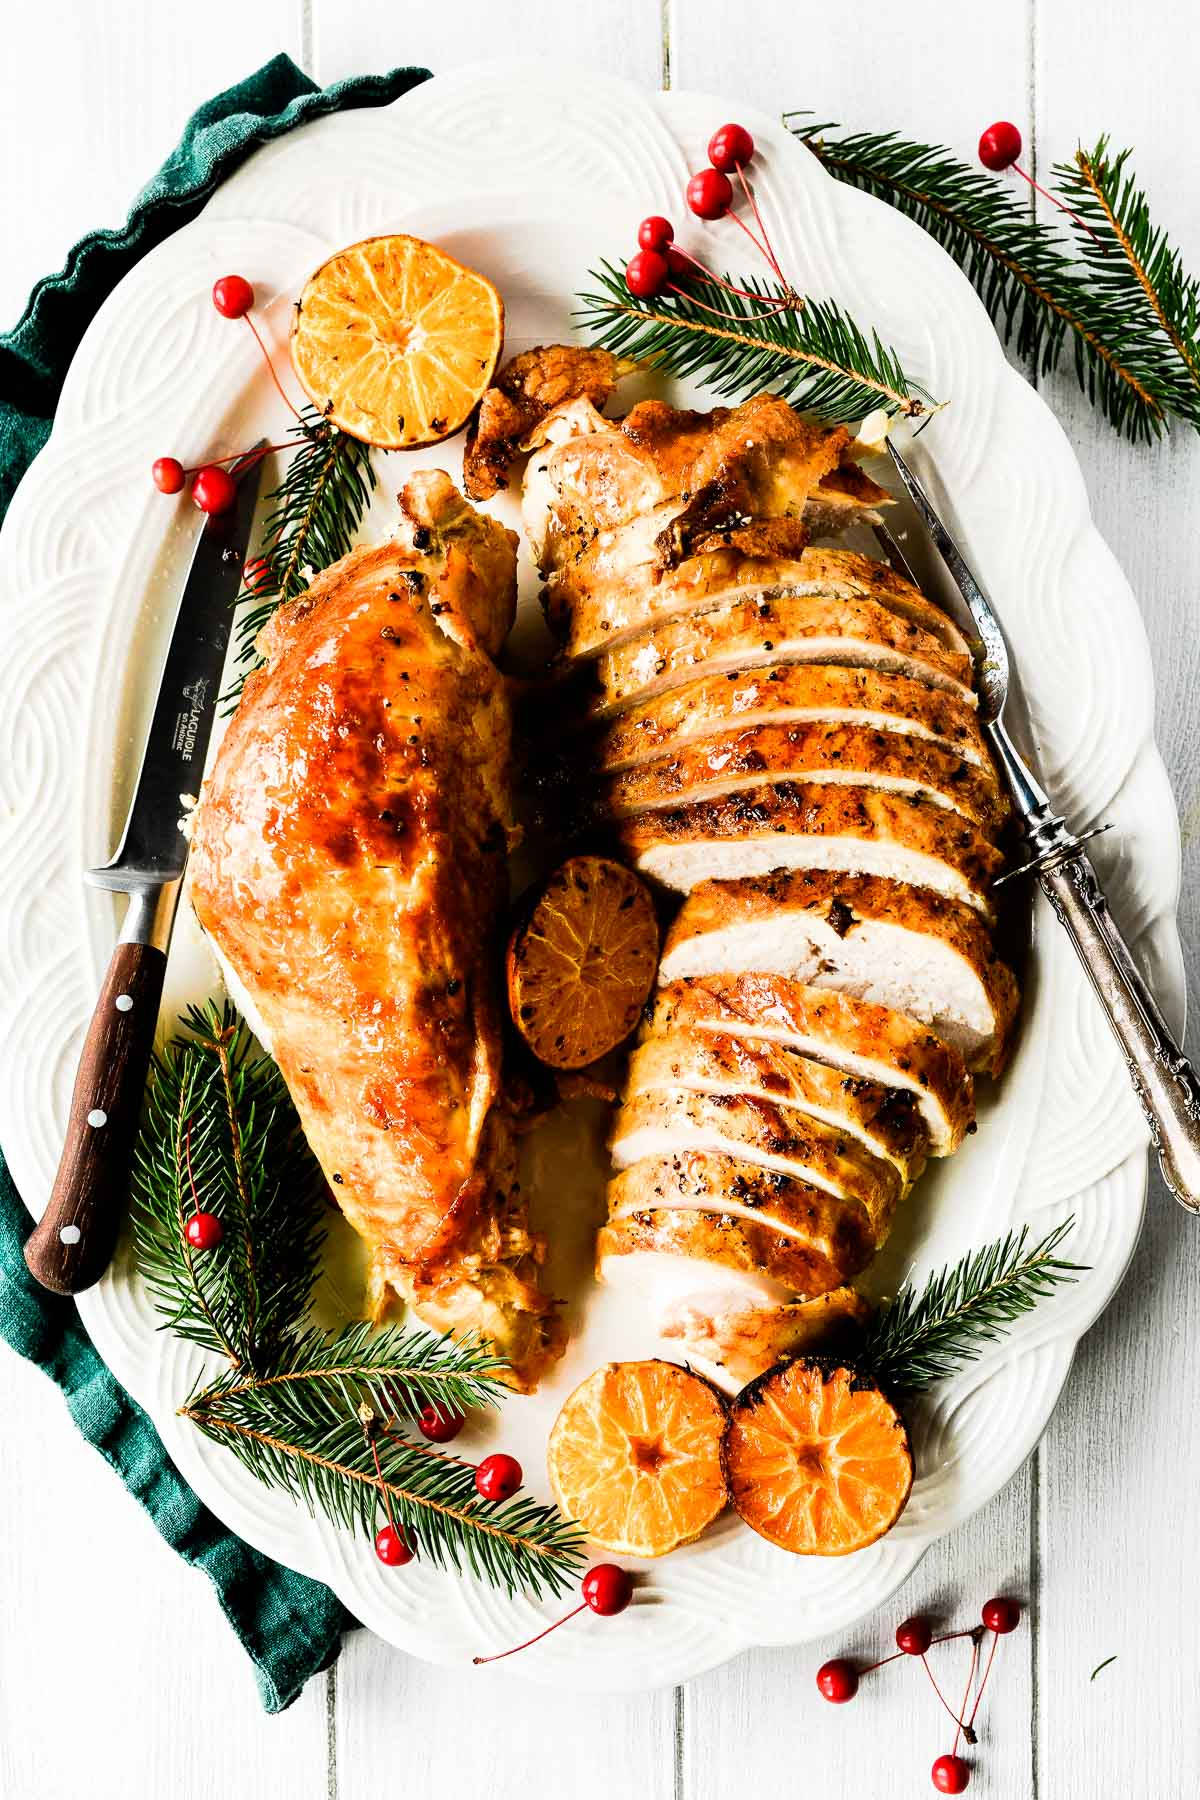 A turkey breast sliced on a platter